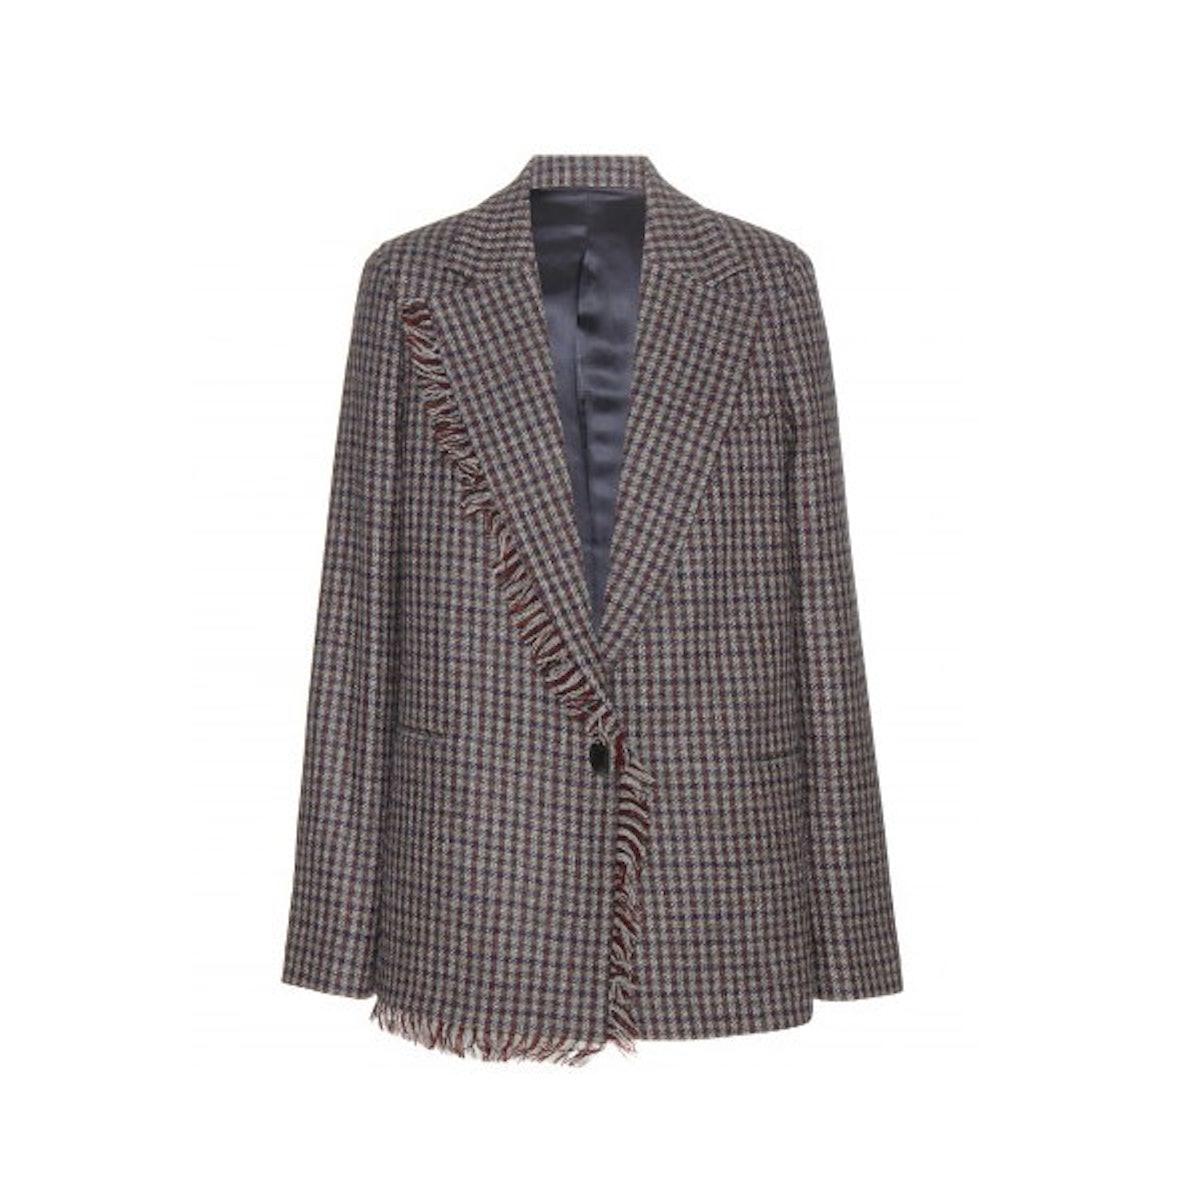 Acne Studios Remis check wool blazer